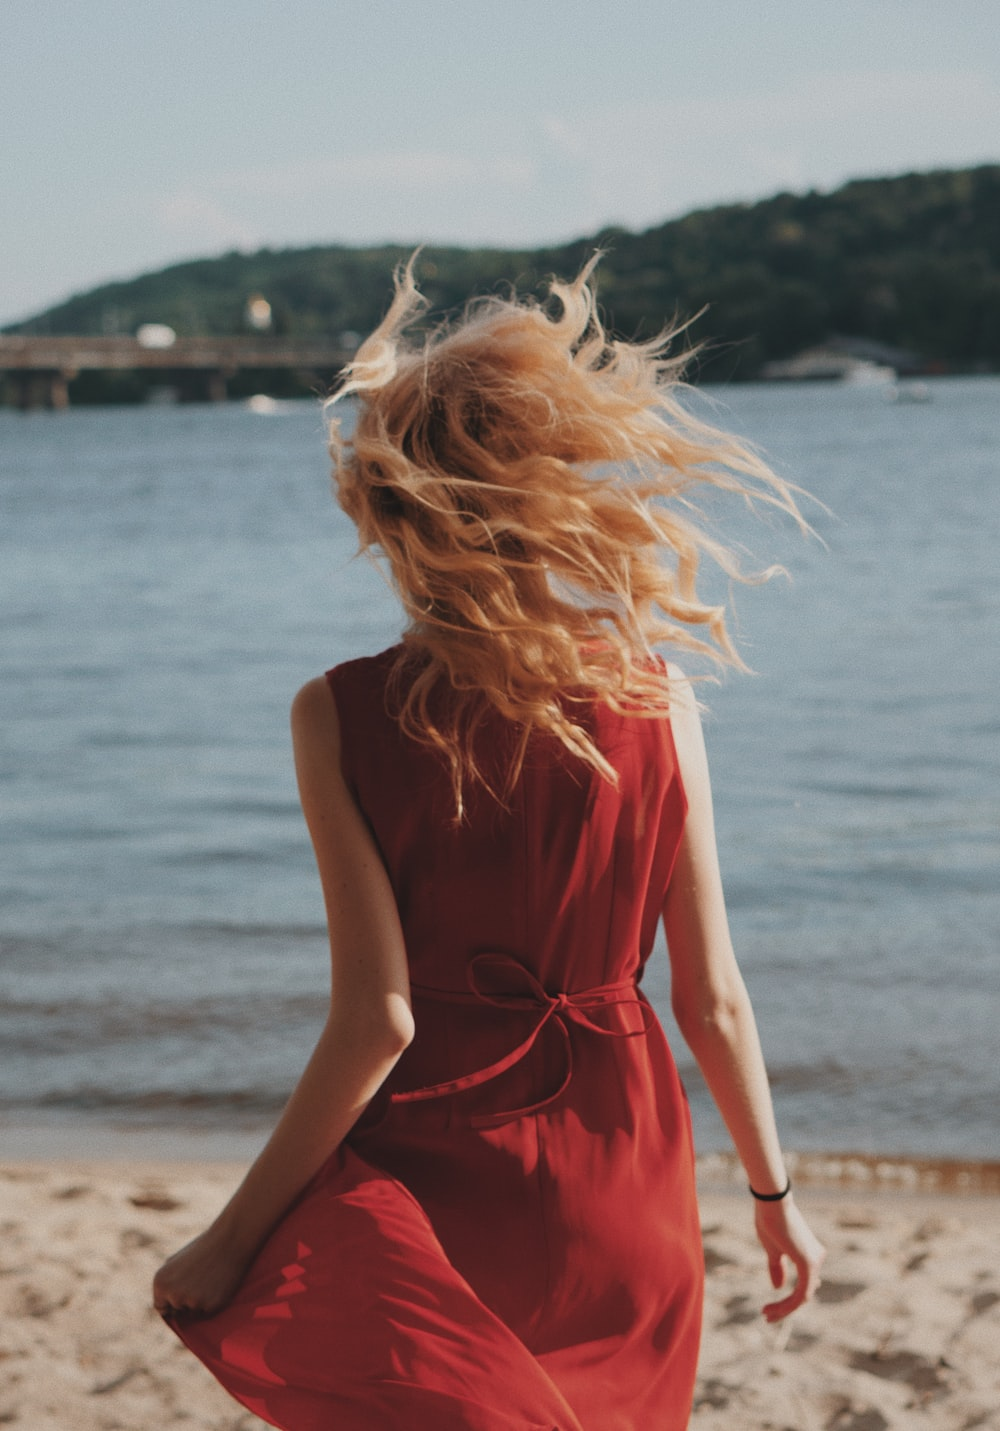 women's red sleeveless mini dress at shore